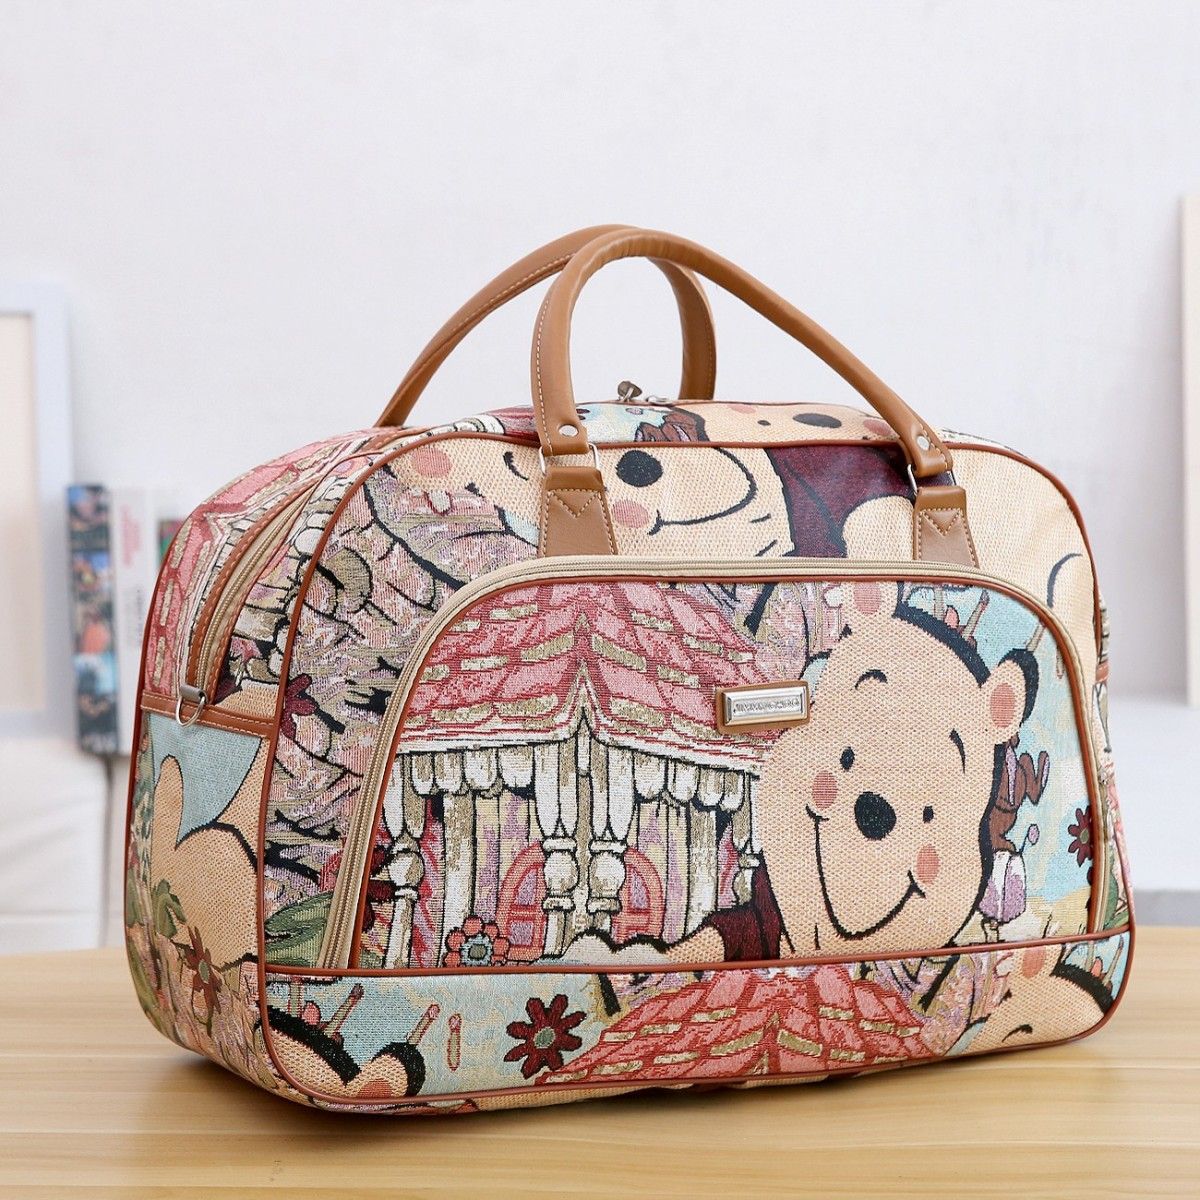 52*35*21cm Women Hand Travel Duffle Bags Pu Leather Weekend Bag Cartoon Large Waterproof Travel Bag